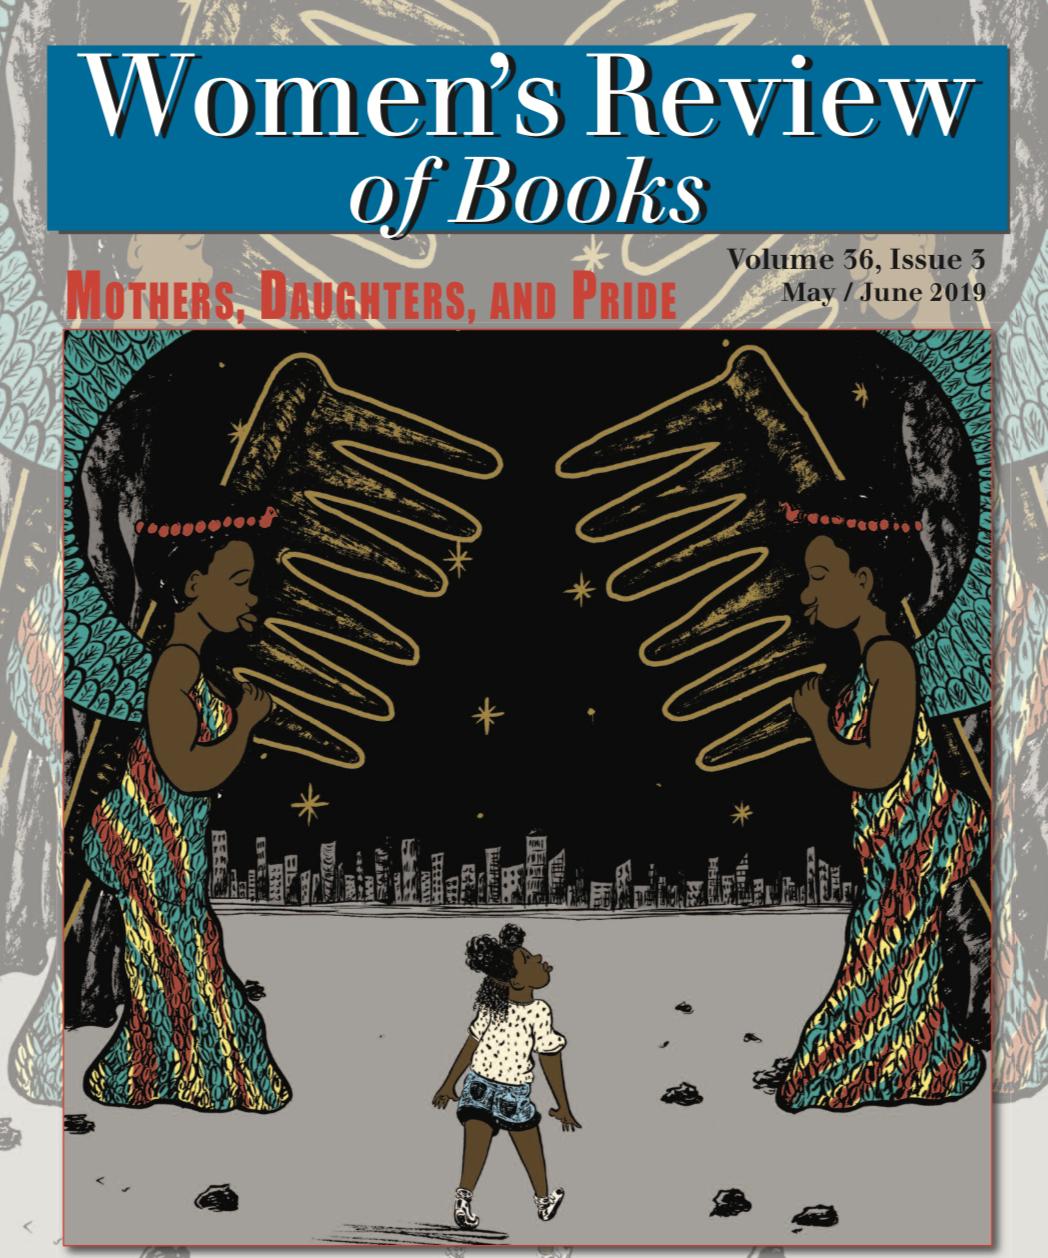 Women's Review of books - A Review of Elderhood